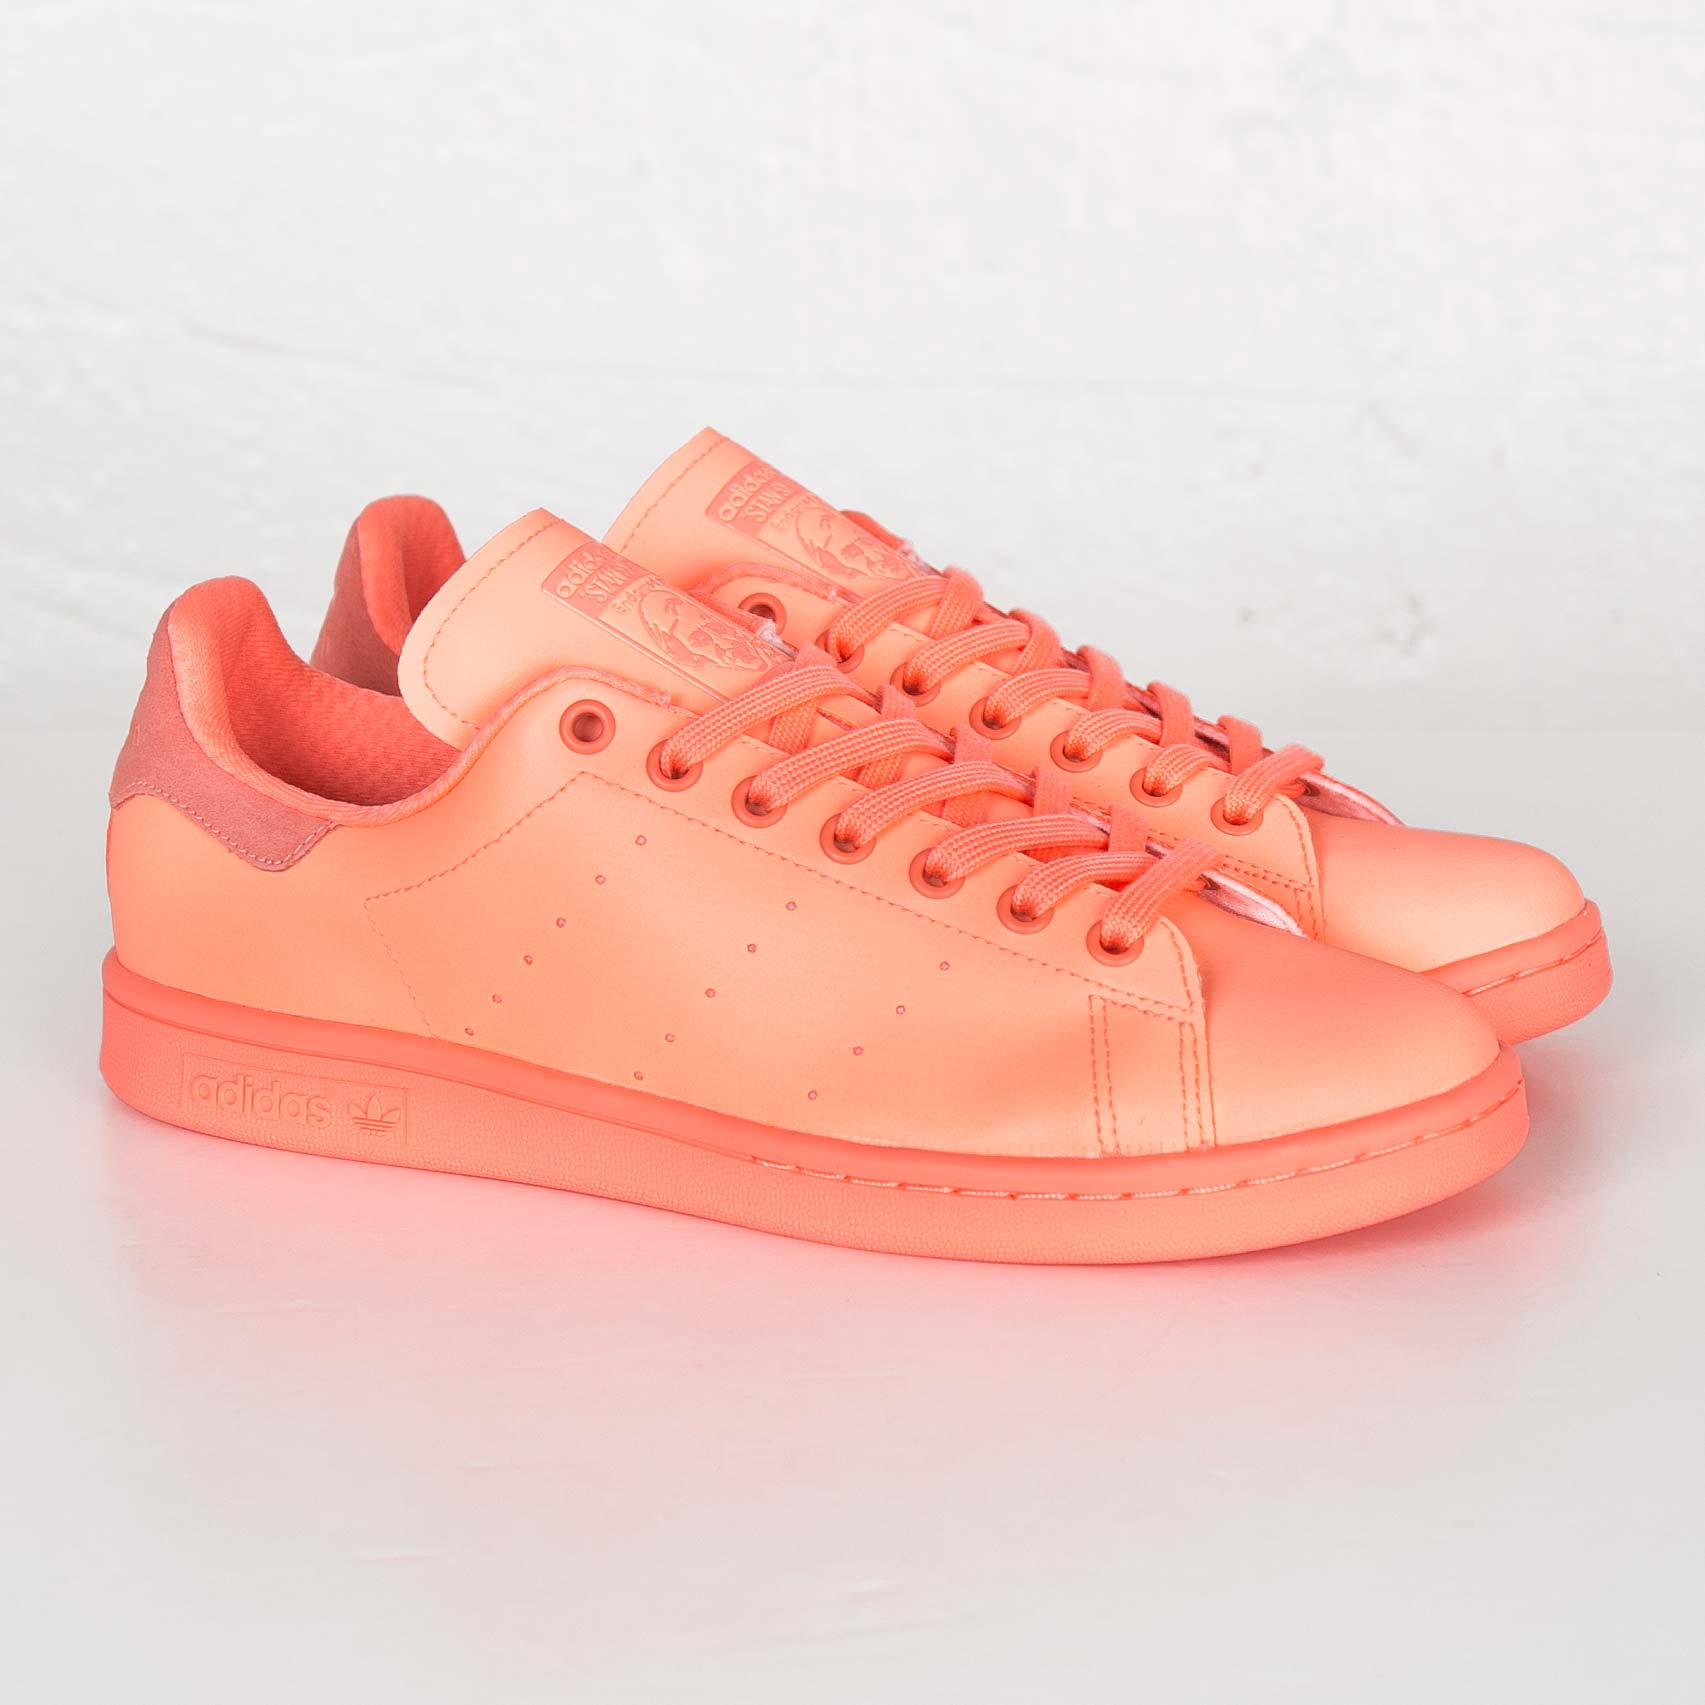 adidas adicolor stan smith s80251 sneakersnstuff turnschuhe